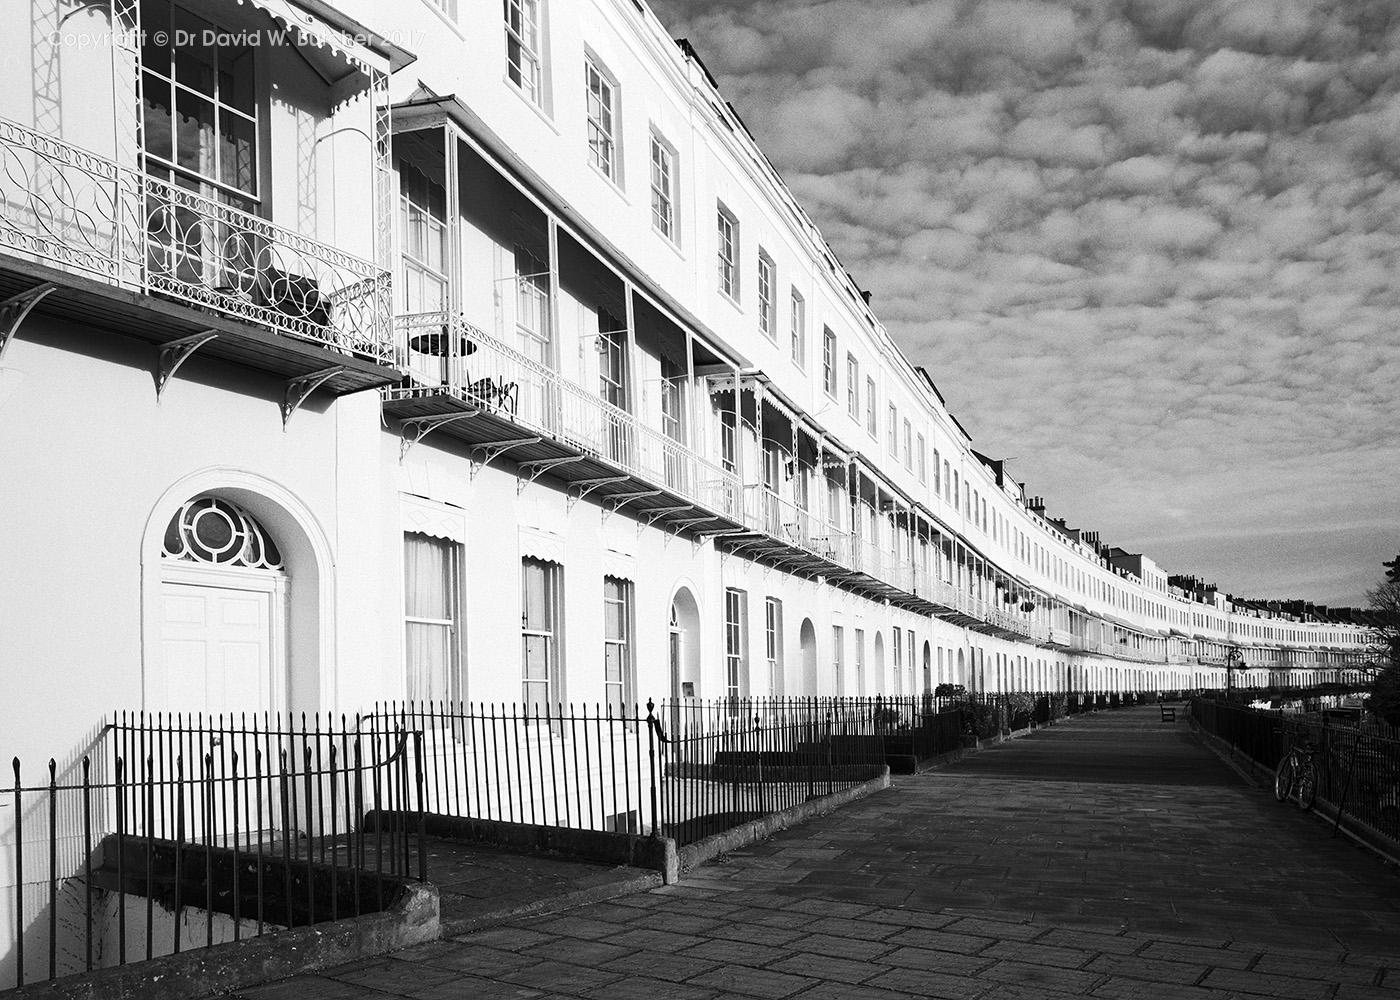 Bristol Clifton Royal York Crescent, England